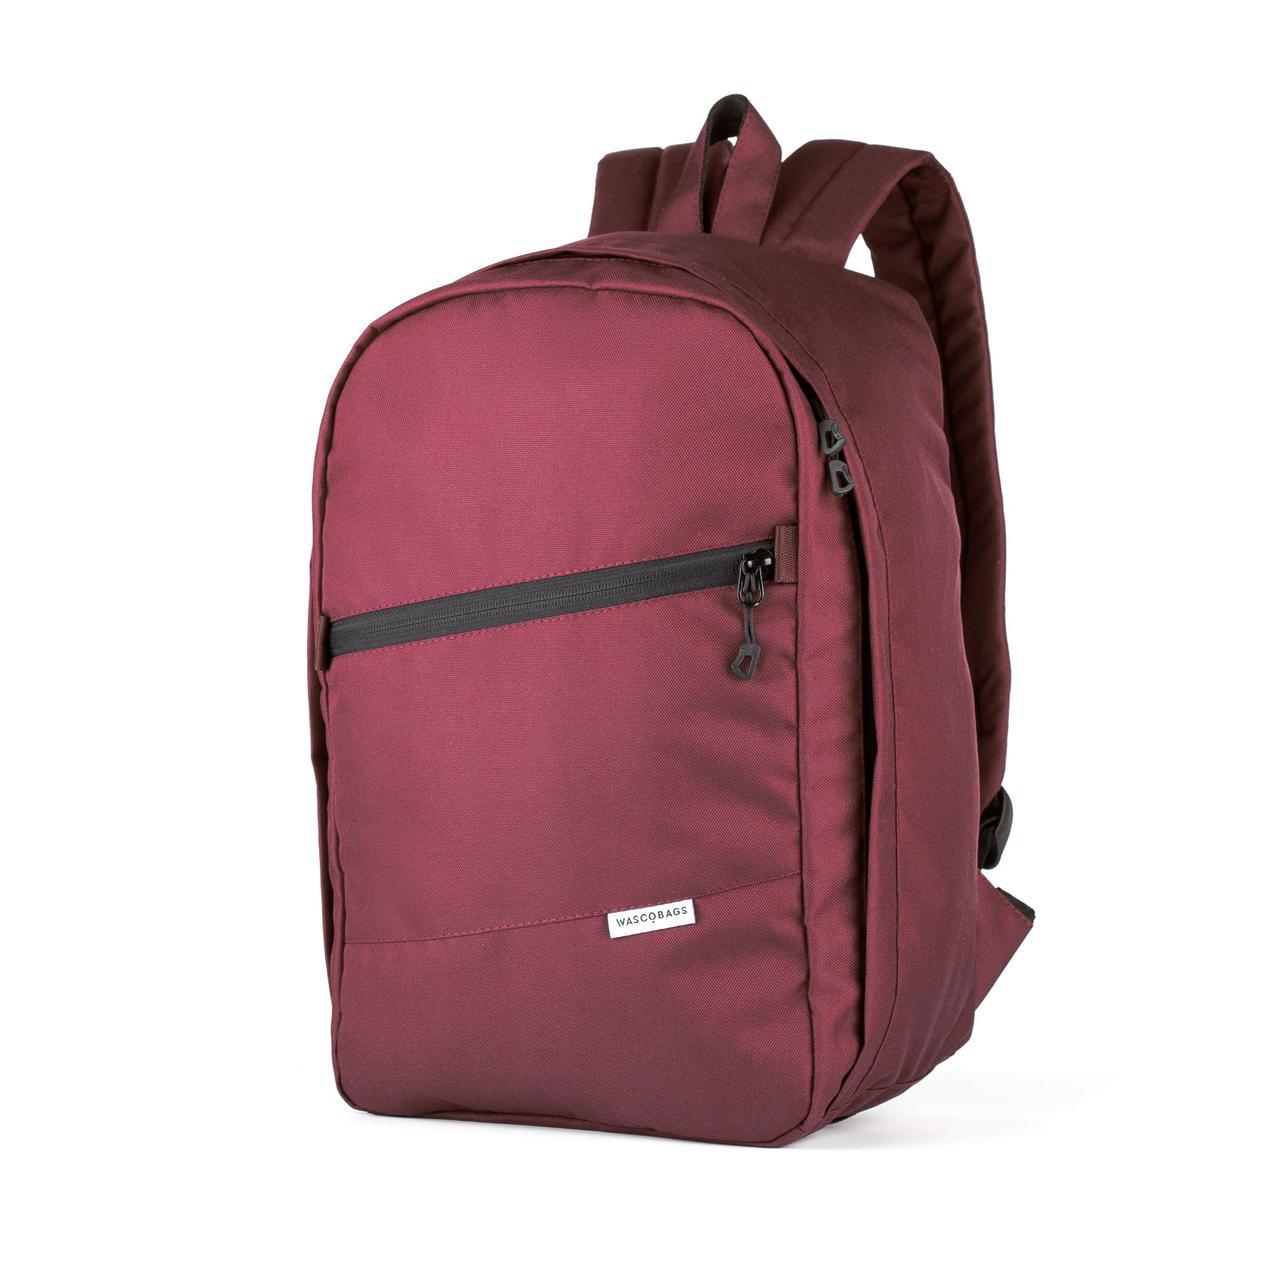 Рюкзак для ручной клади 40x20x25 Wascobags J-Satch S Бордо